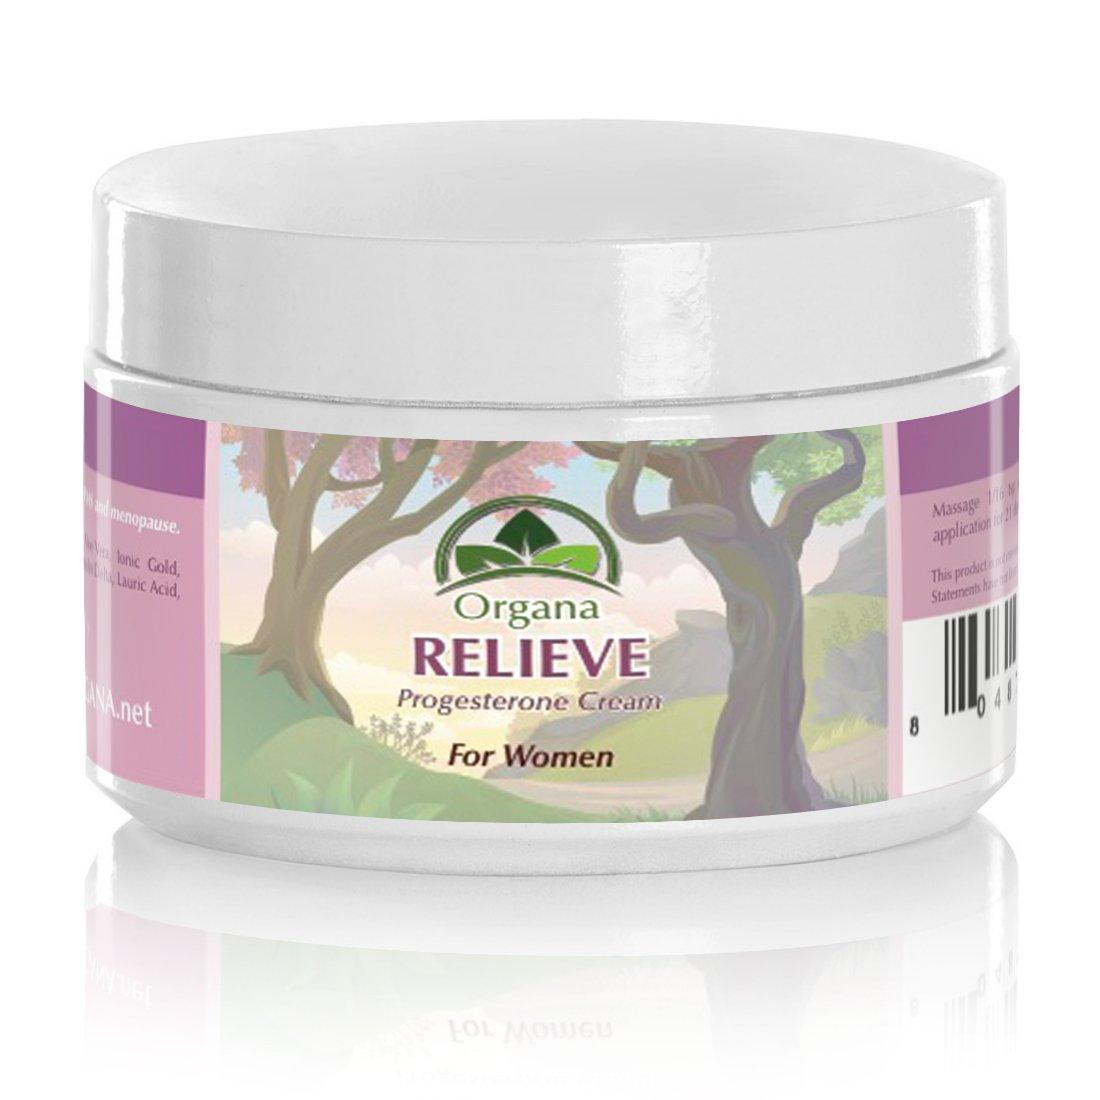 THE BEST All Natural Progesterone Cream - Amazing All Natural Progesterone Cream - Organic - No Synthetics - Progesterone Cream for Women and Men